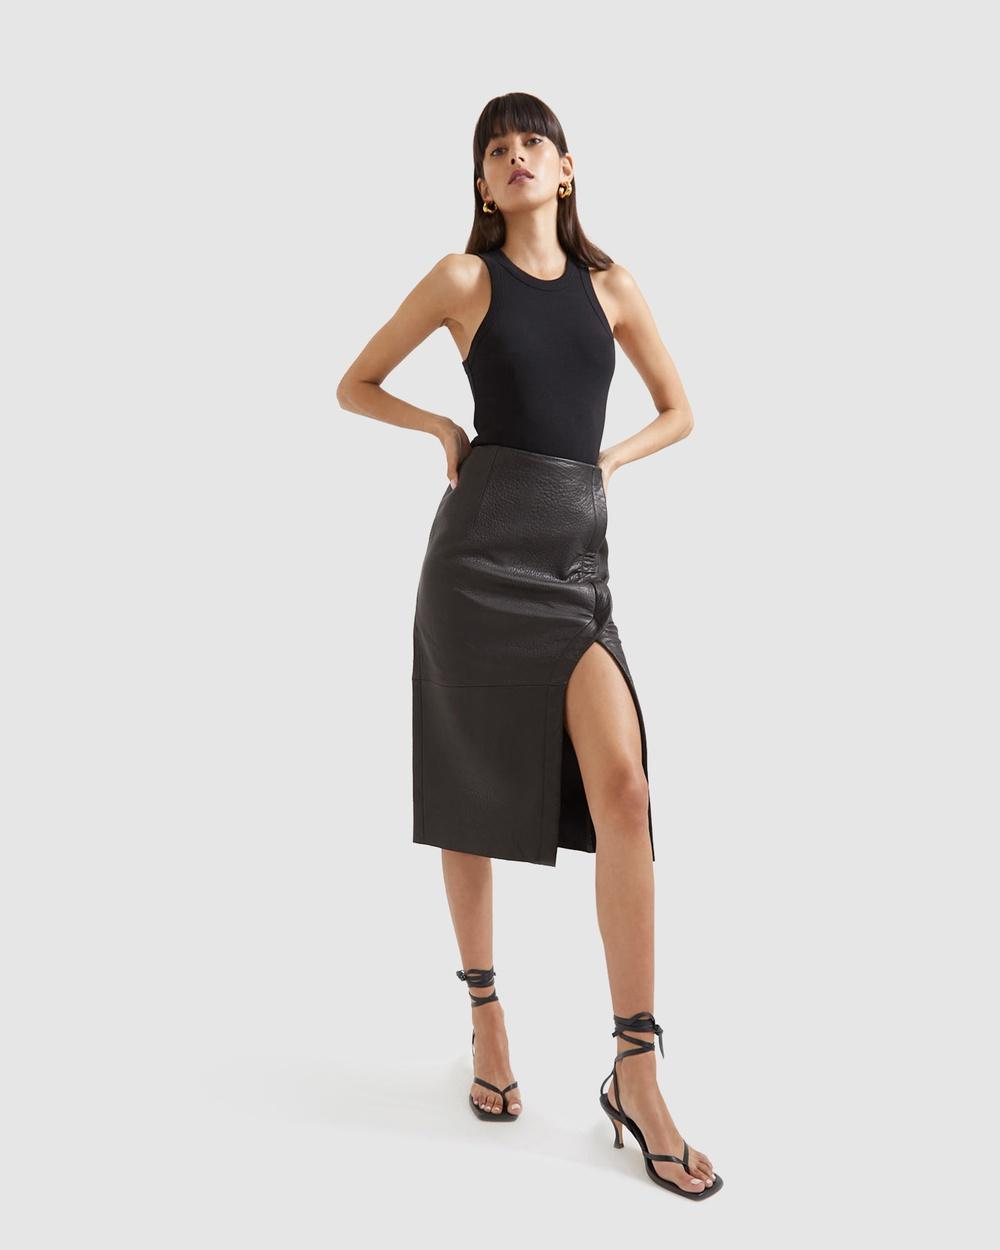 SABA Lilia Leather Pencil Skirt skirts Black